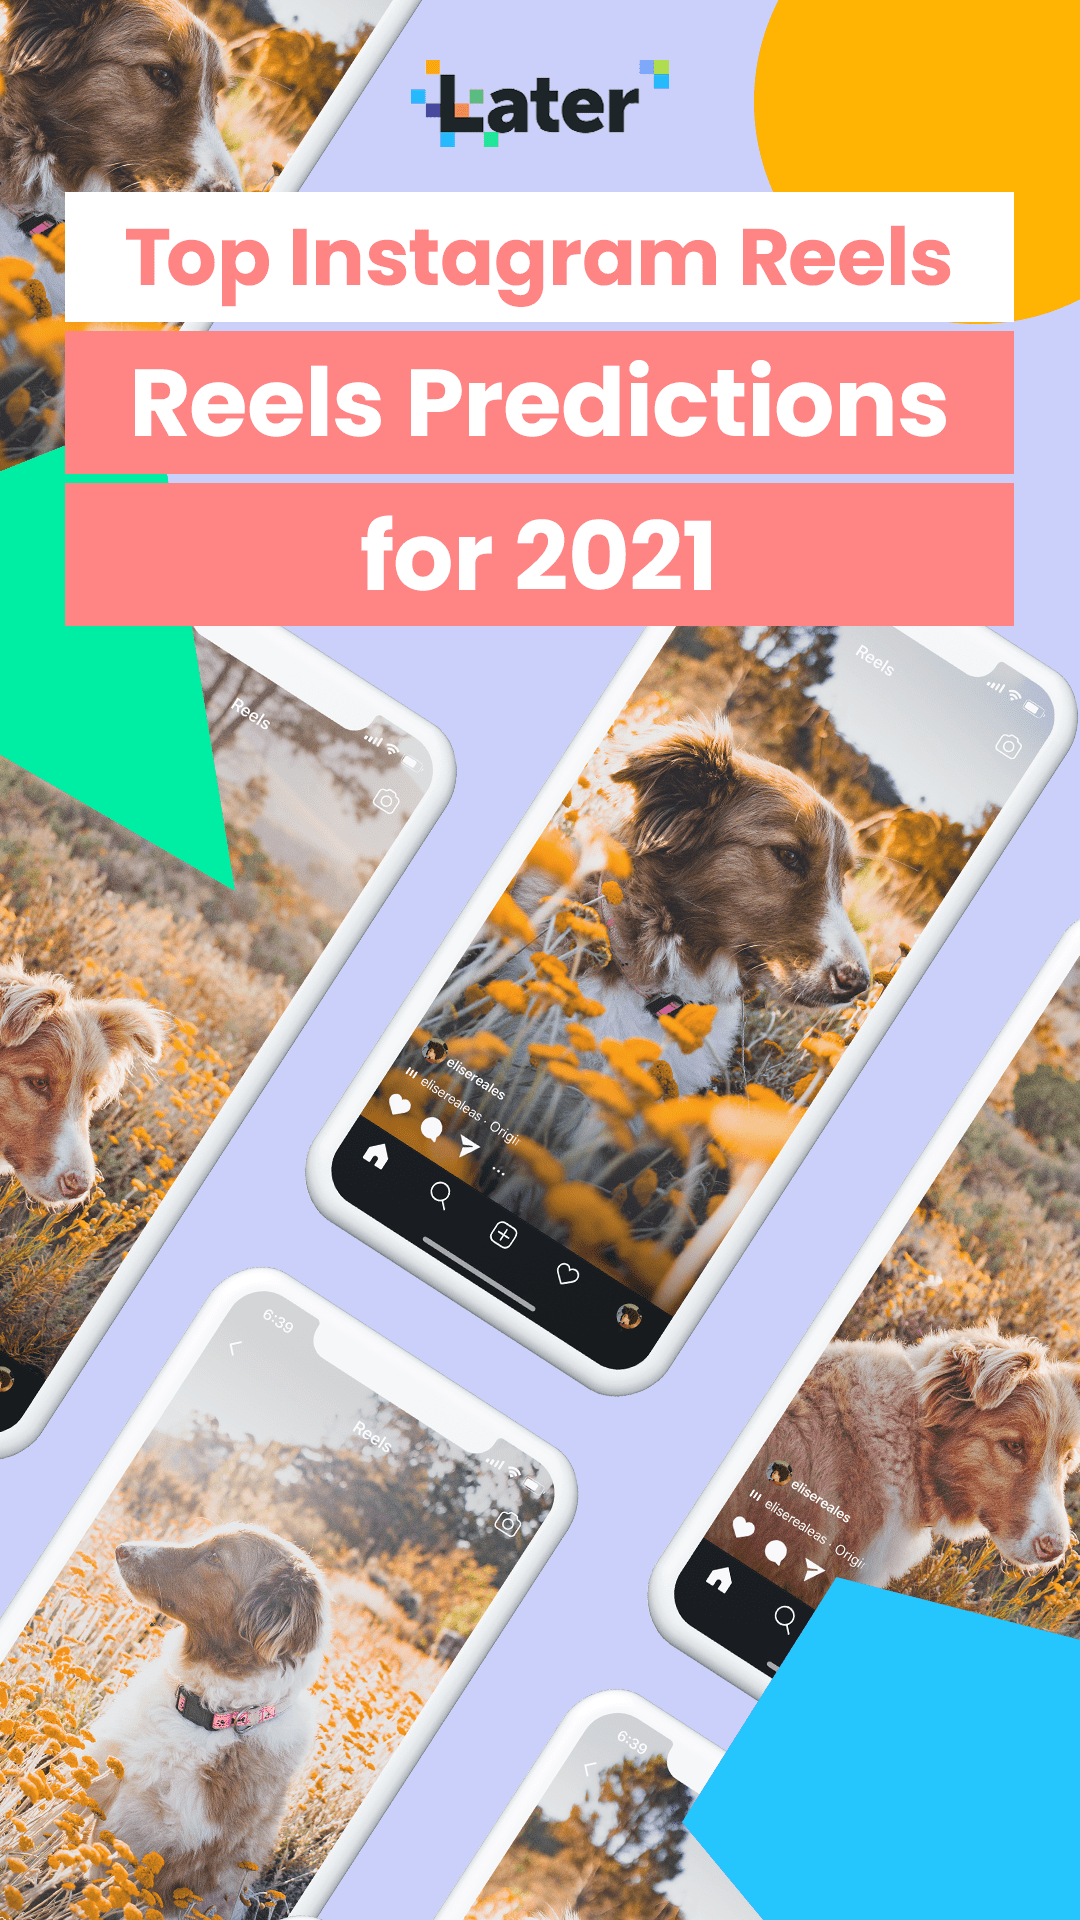 10 Instagram Reels Predictions For 2021 How To Prepare For Them Later Blog Instagram Algorithm Instagram Story Ads Instagram Creator